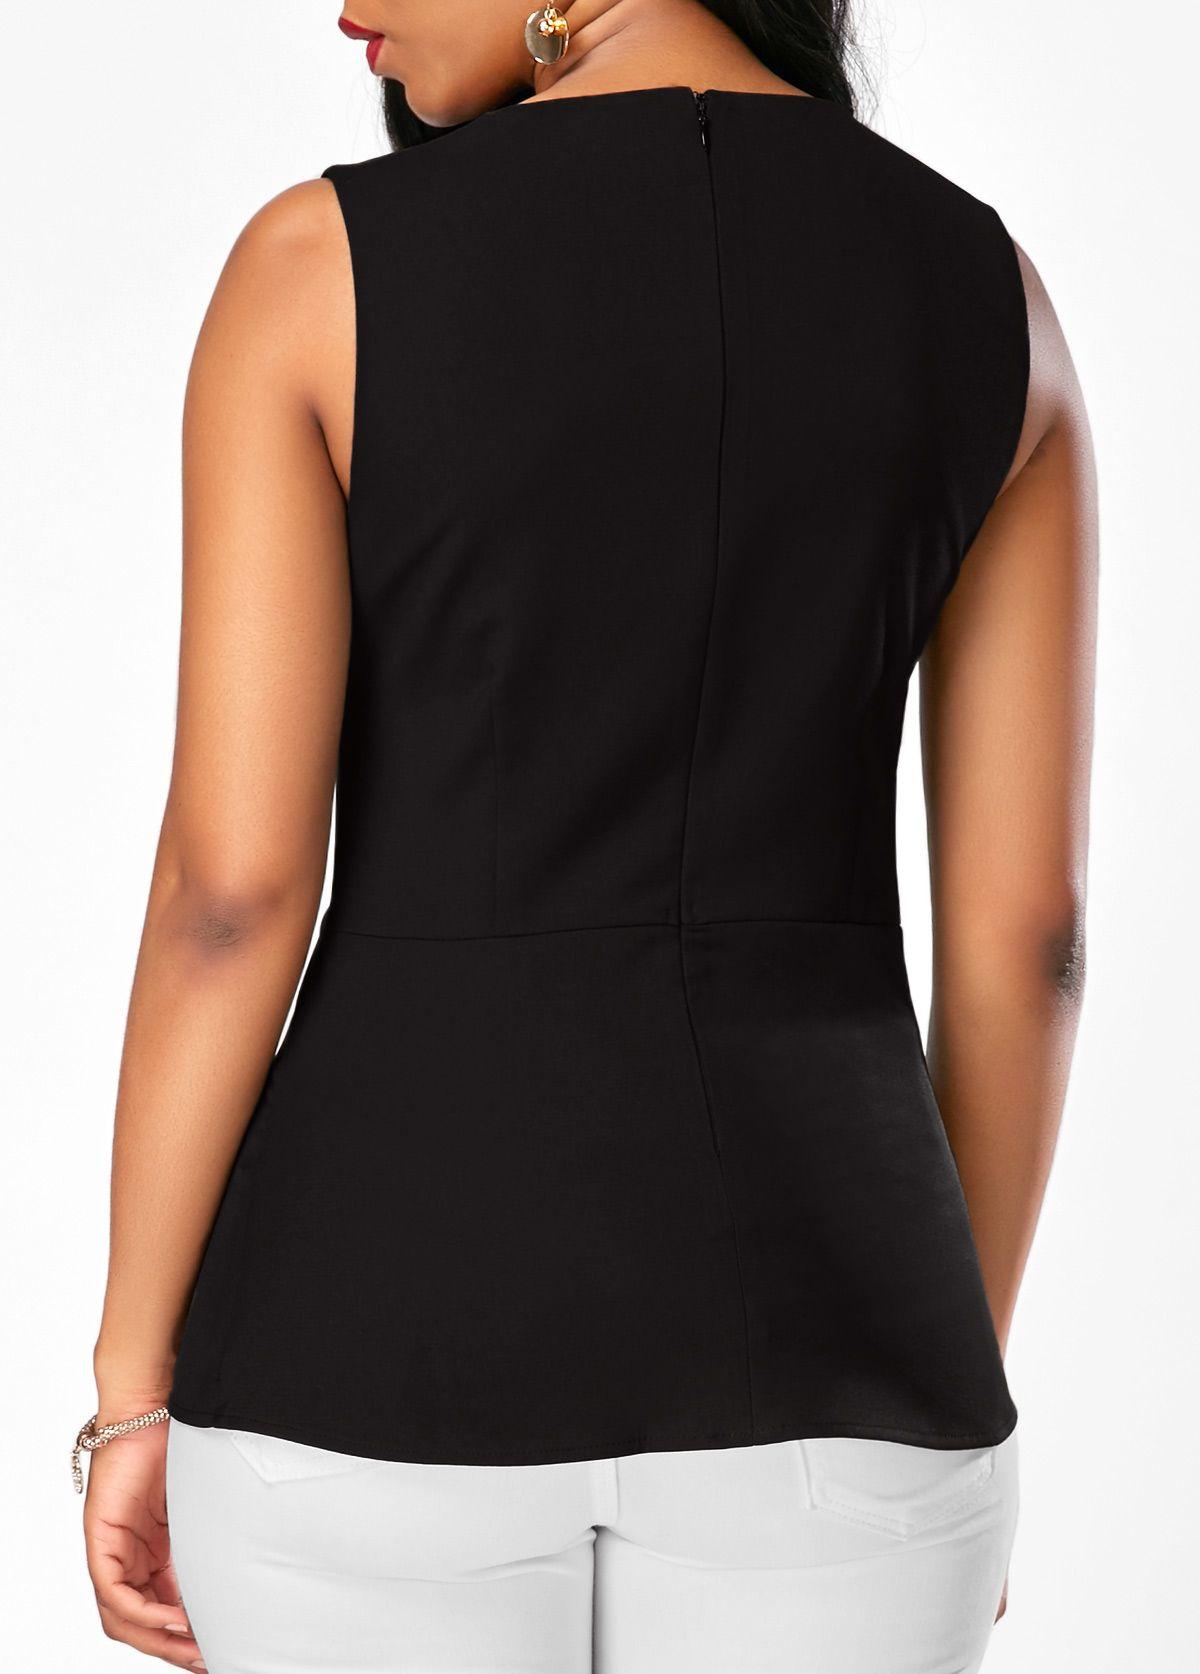 7de46d0404db Patchwork Sleeveless Black Zipper Back Blouse   Rosewe.com - USD $29.58